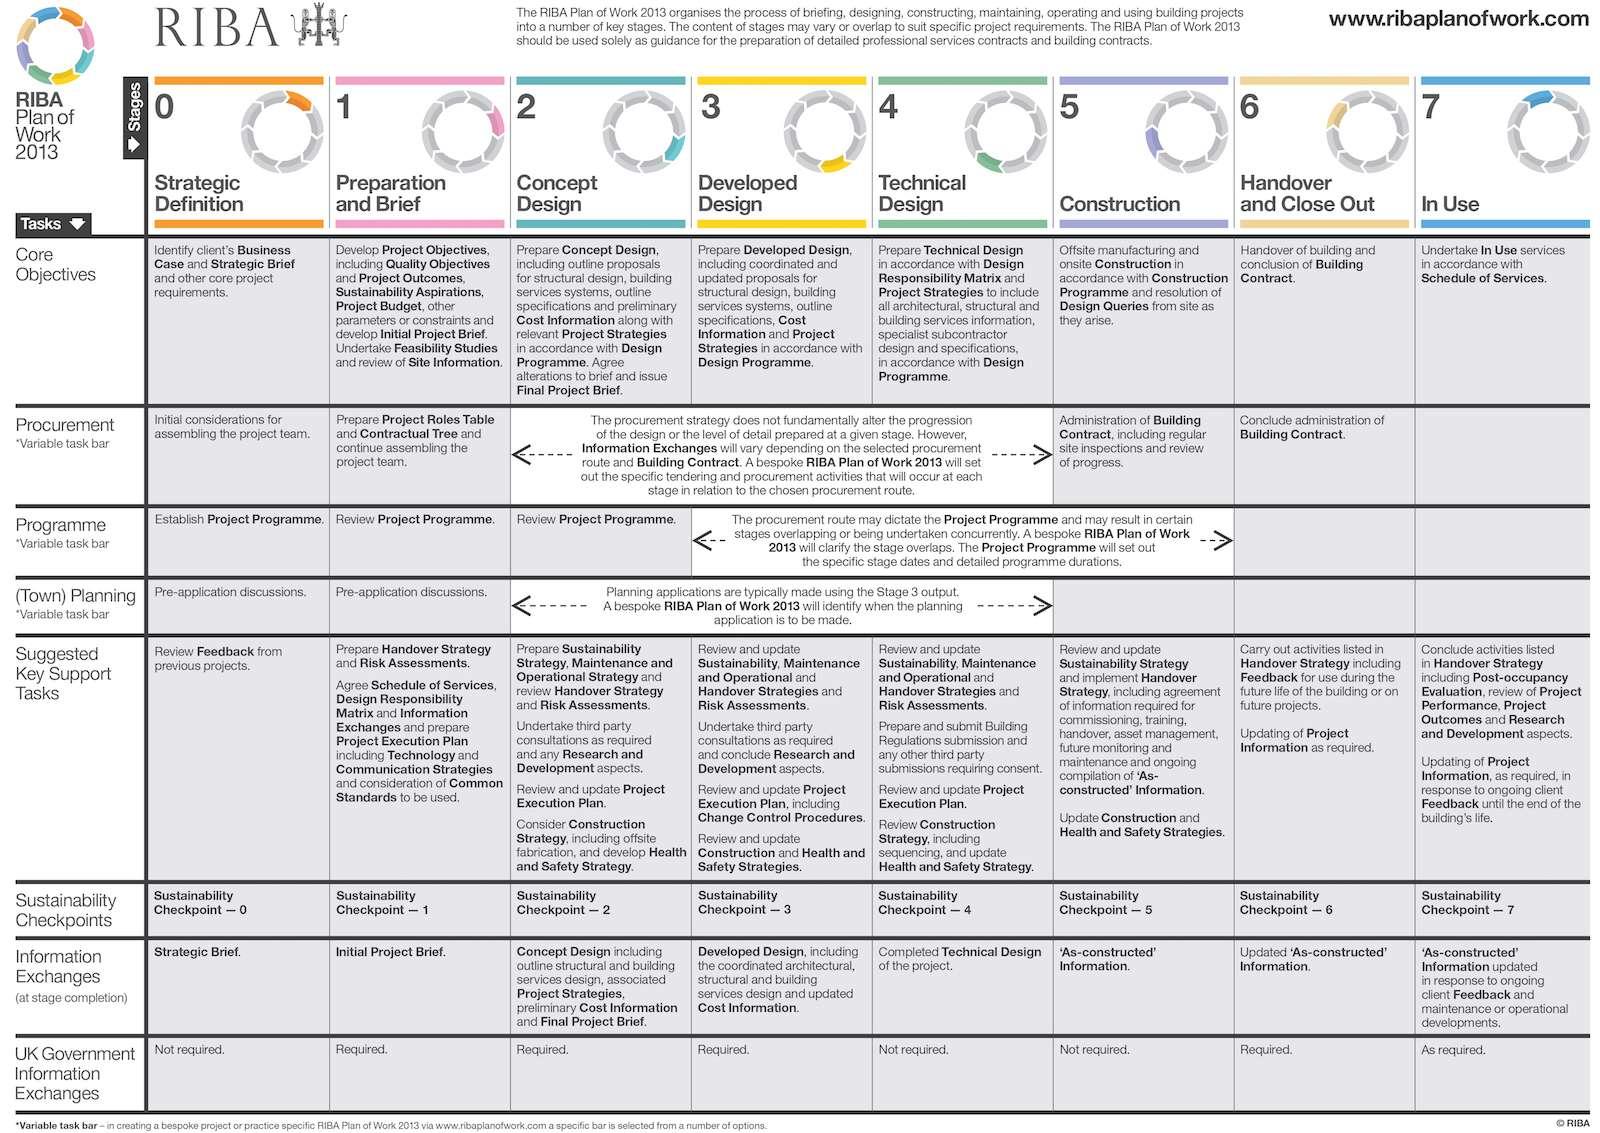 RIBA Plan of Work 2013 RIBA Workstages 0 6 | London